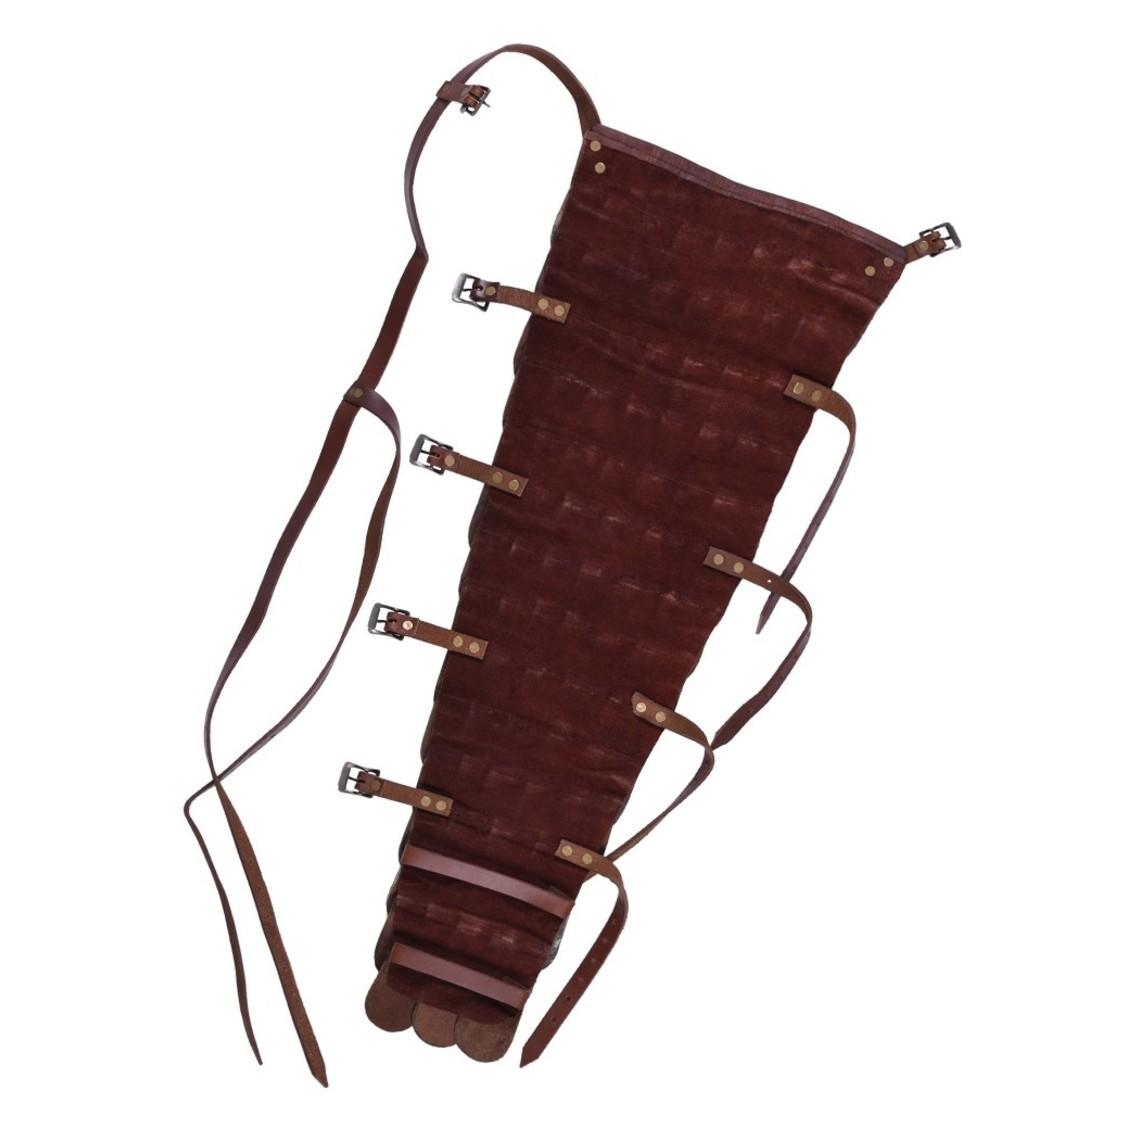 Deepeeka Pelle scalato manica / armguard gladiatore